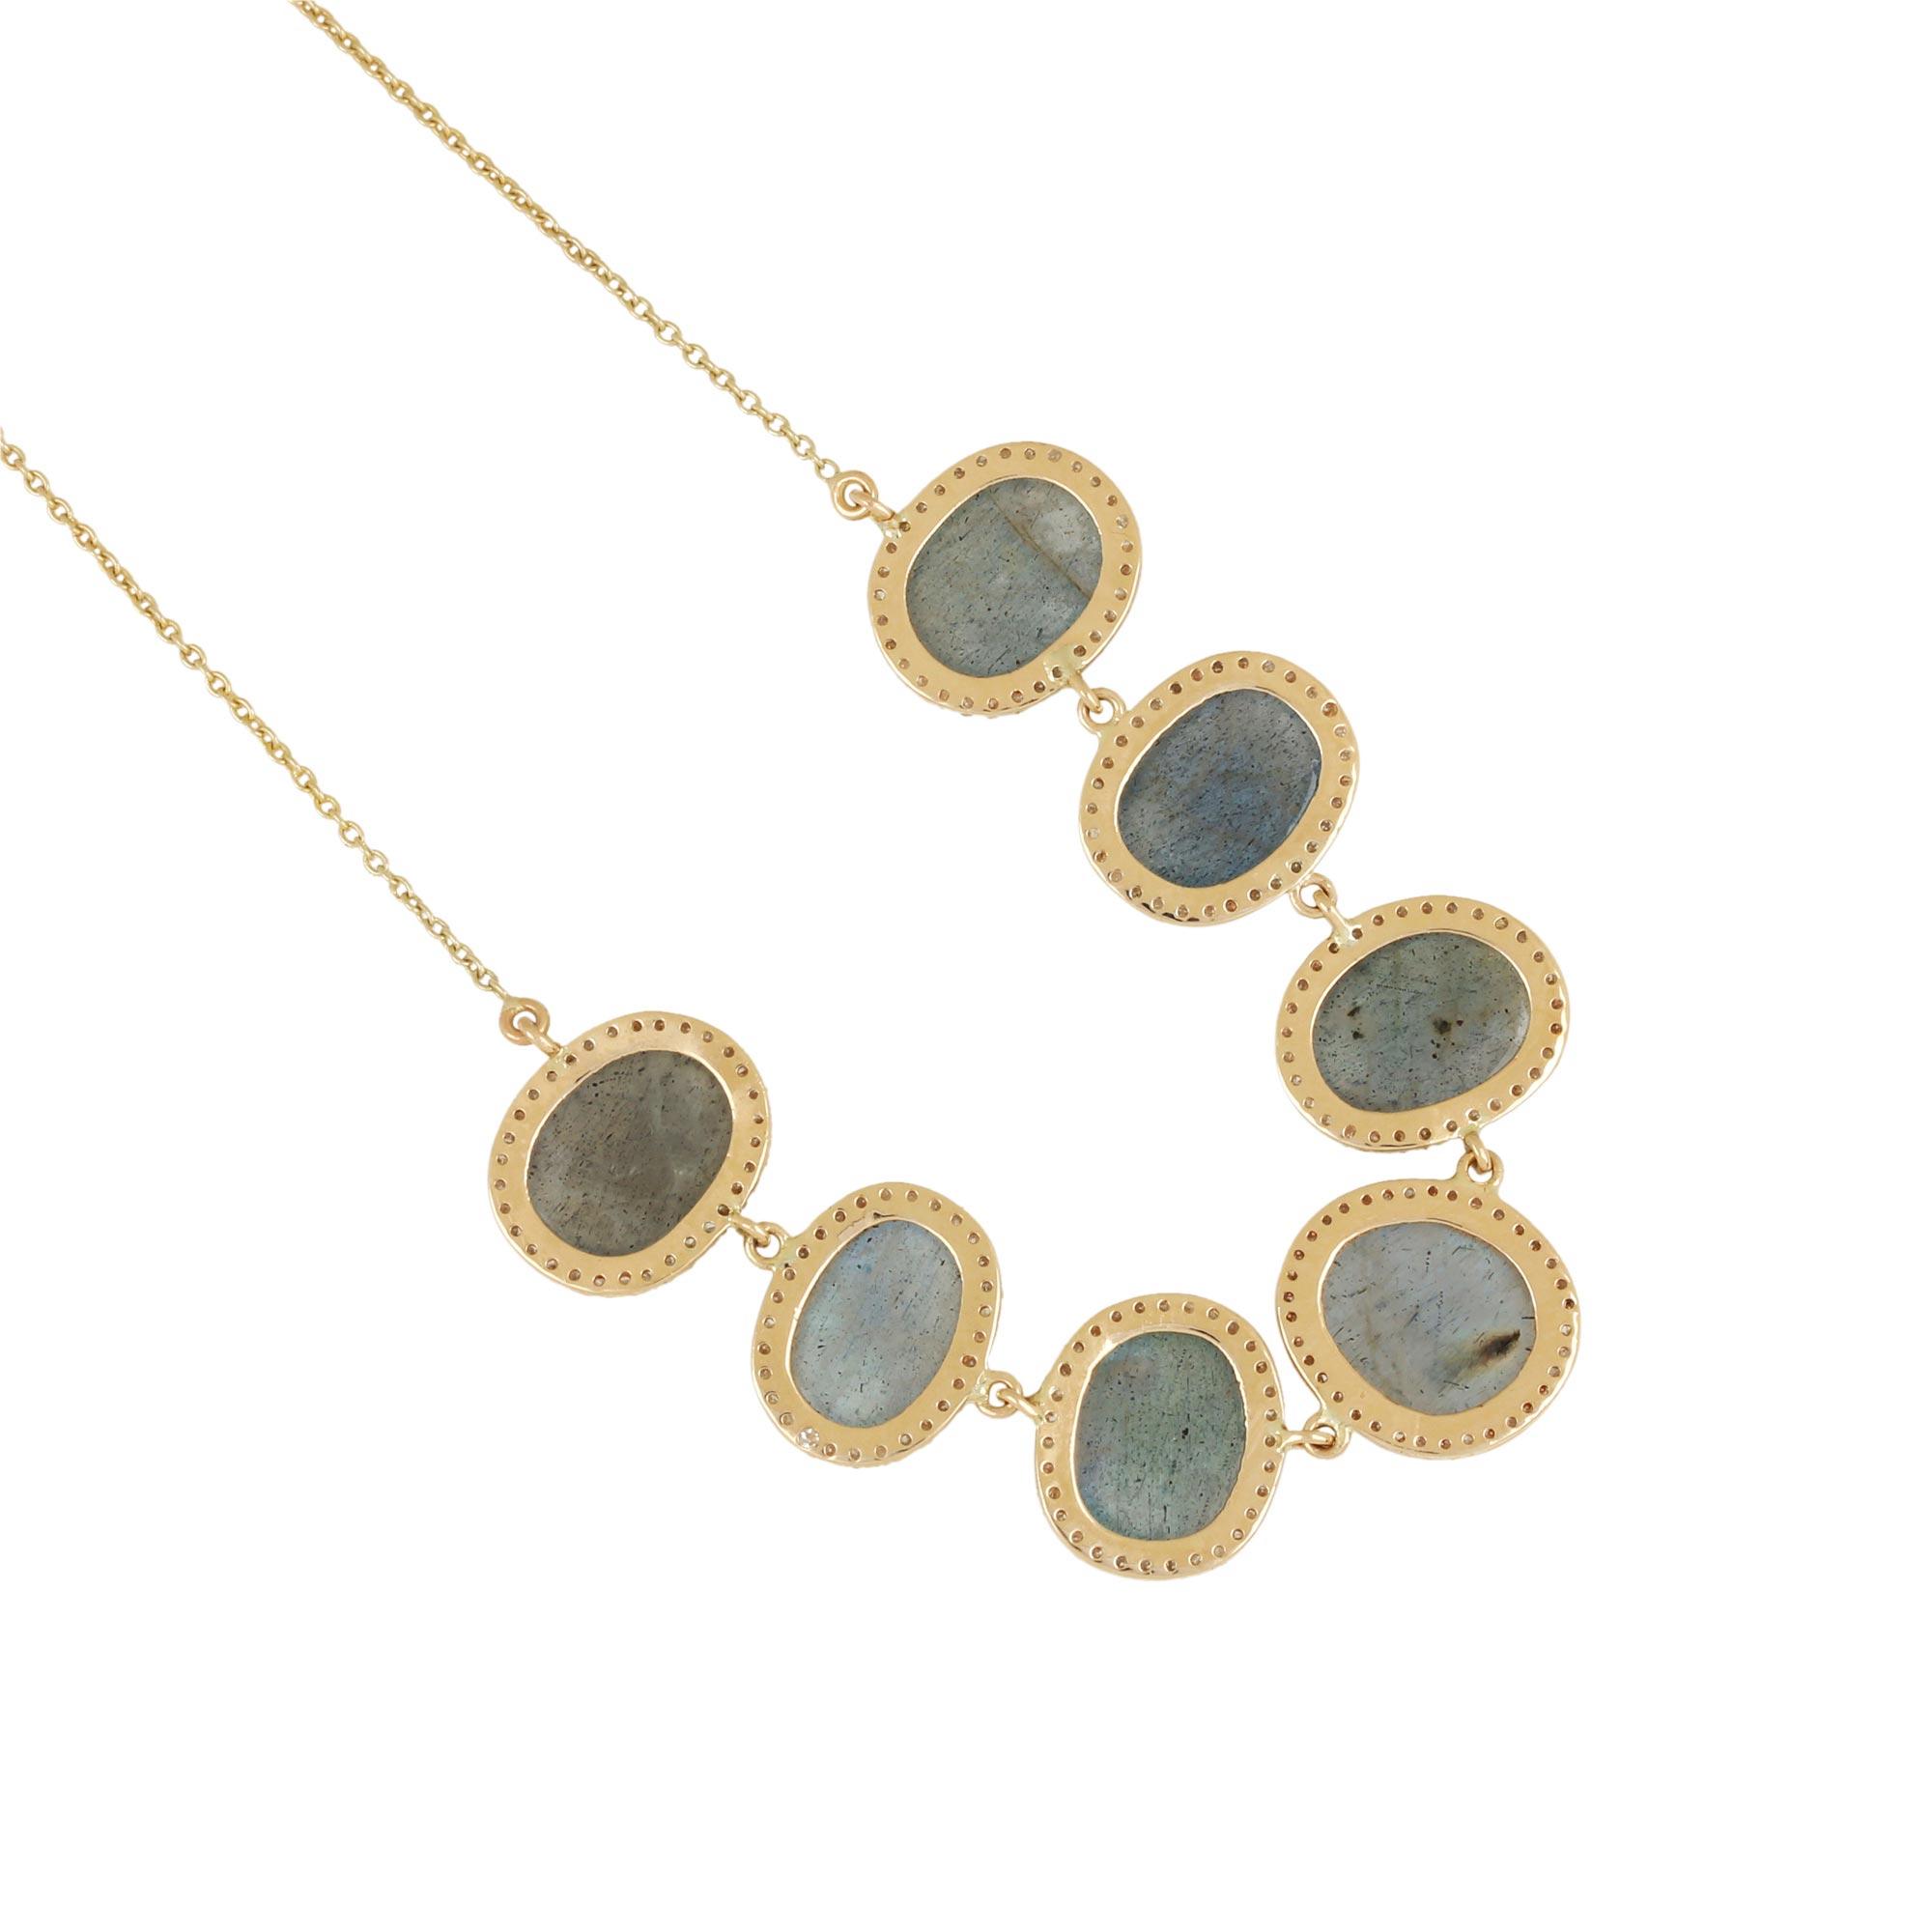 Labradorite Gemstone Pave Diamond Pendant Chain Necklace 14K Solid Gold Jewelry